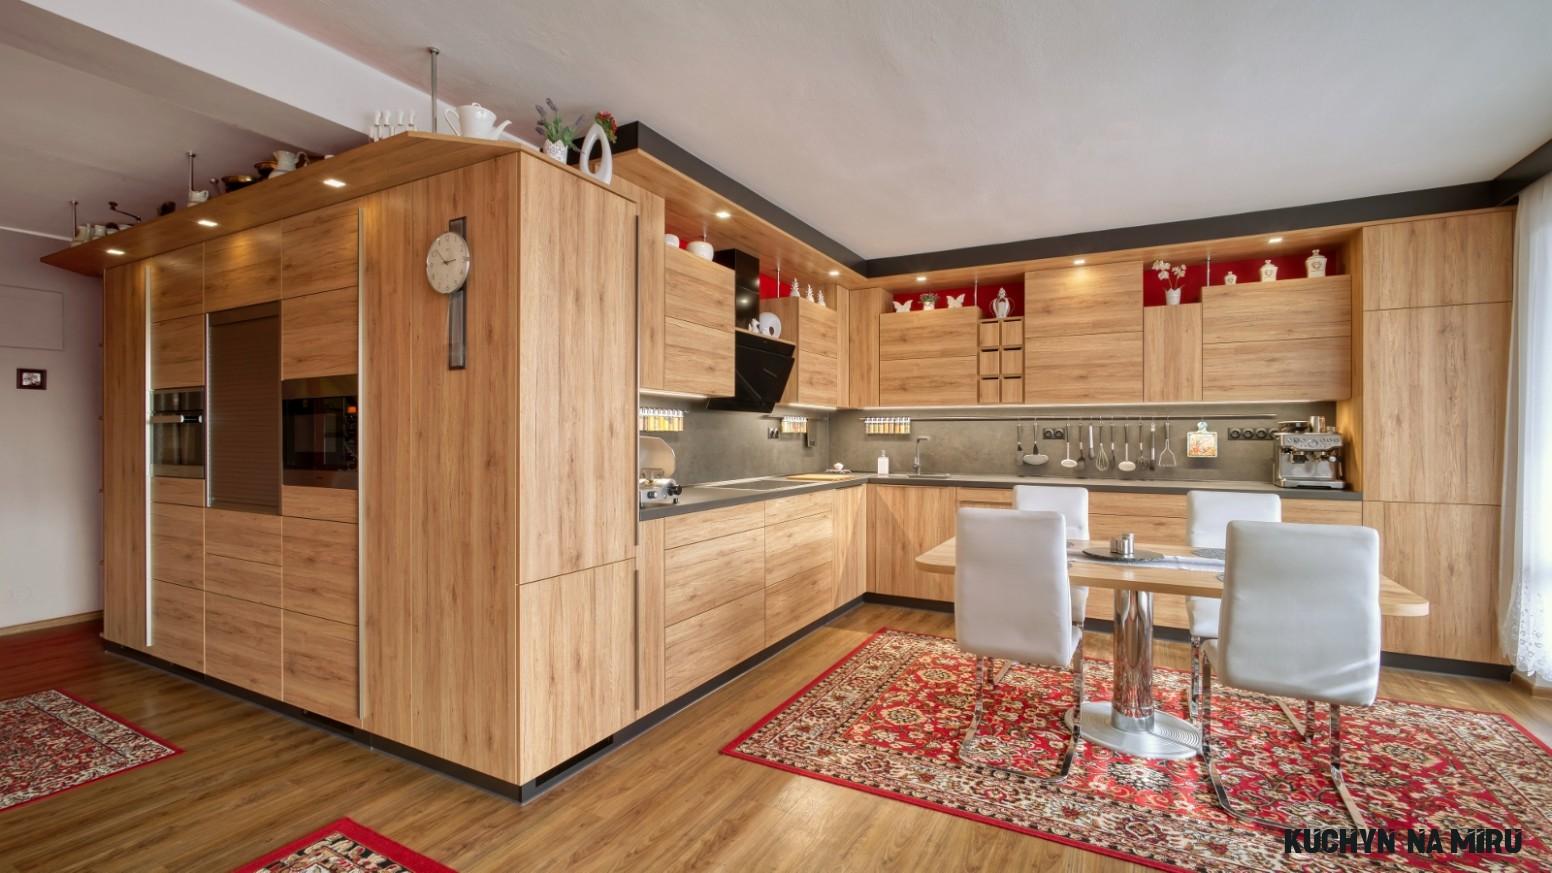 Kuchyně na míru  Gabon Brno, kuchyňské studio